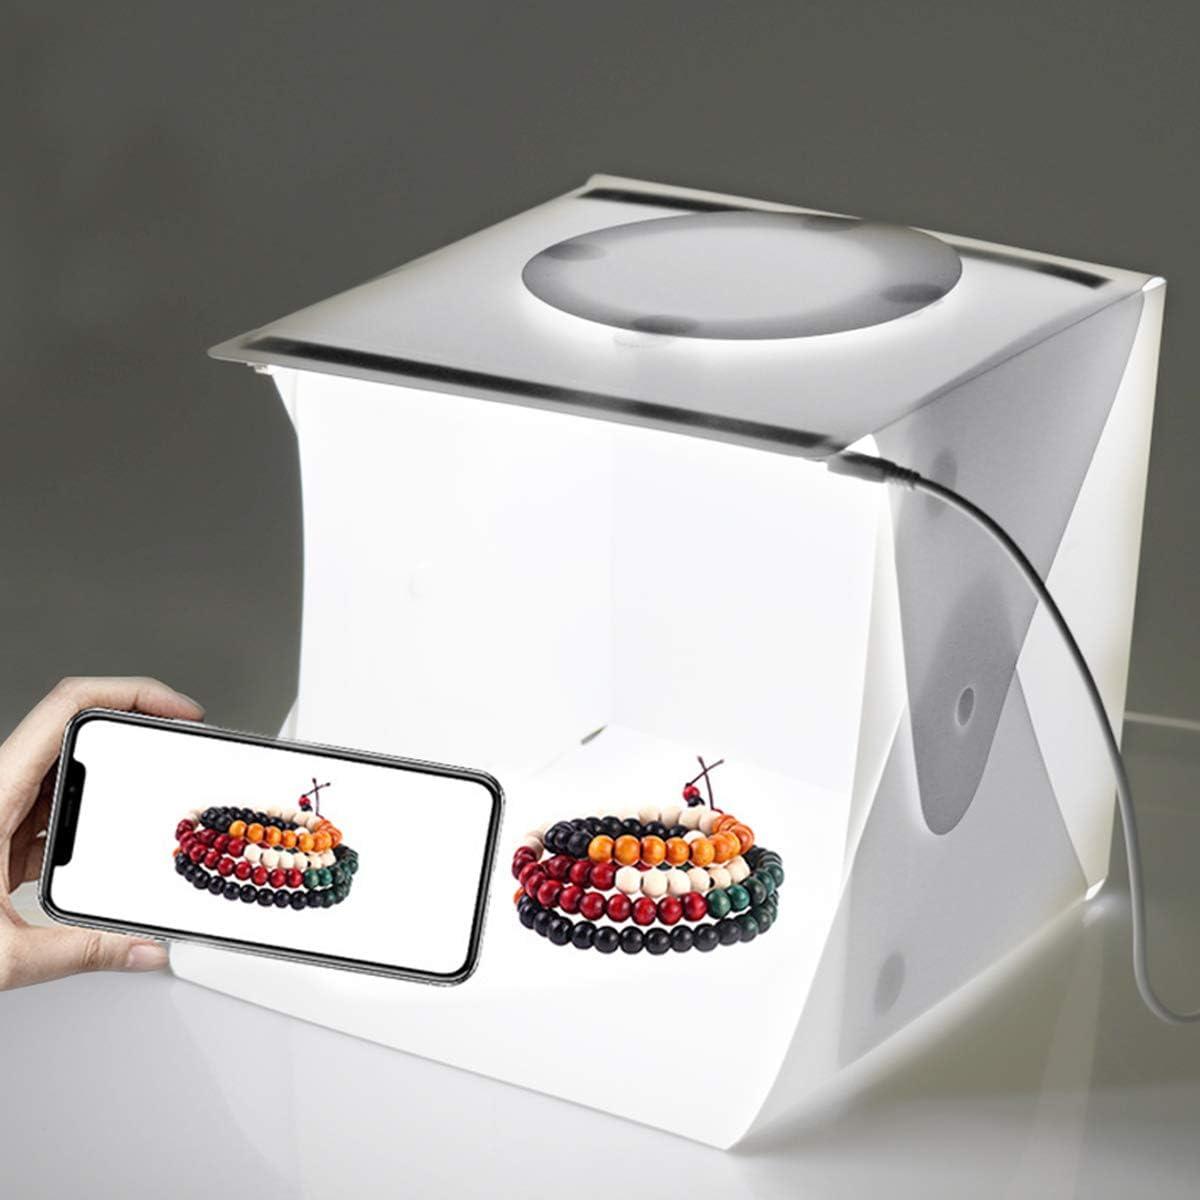 jskjlkl Portable Mini Folding Light Box Photography Photo Studio Box with Dual LED Strip Lights 6 Backdrops